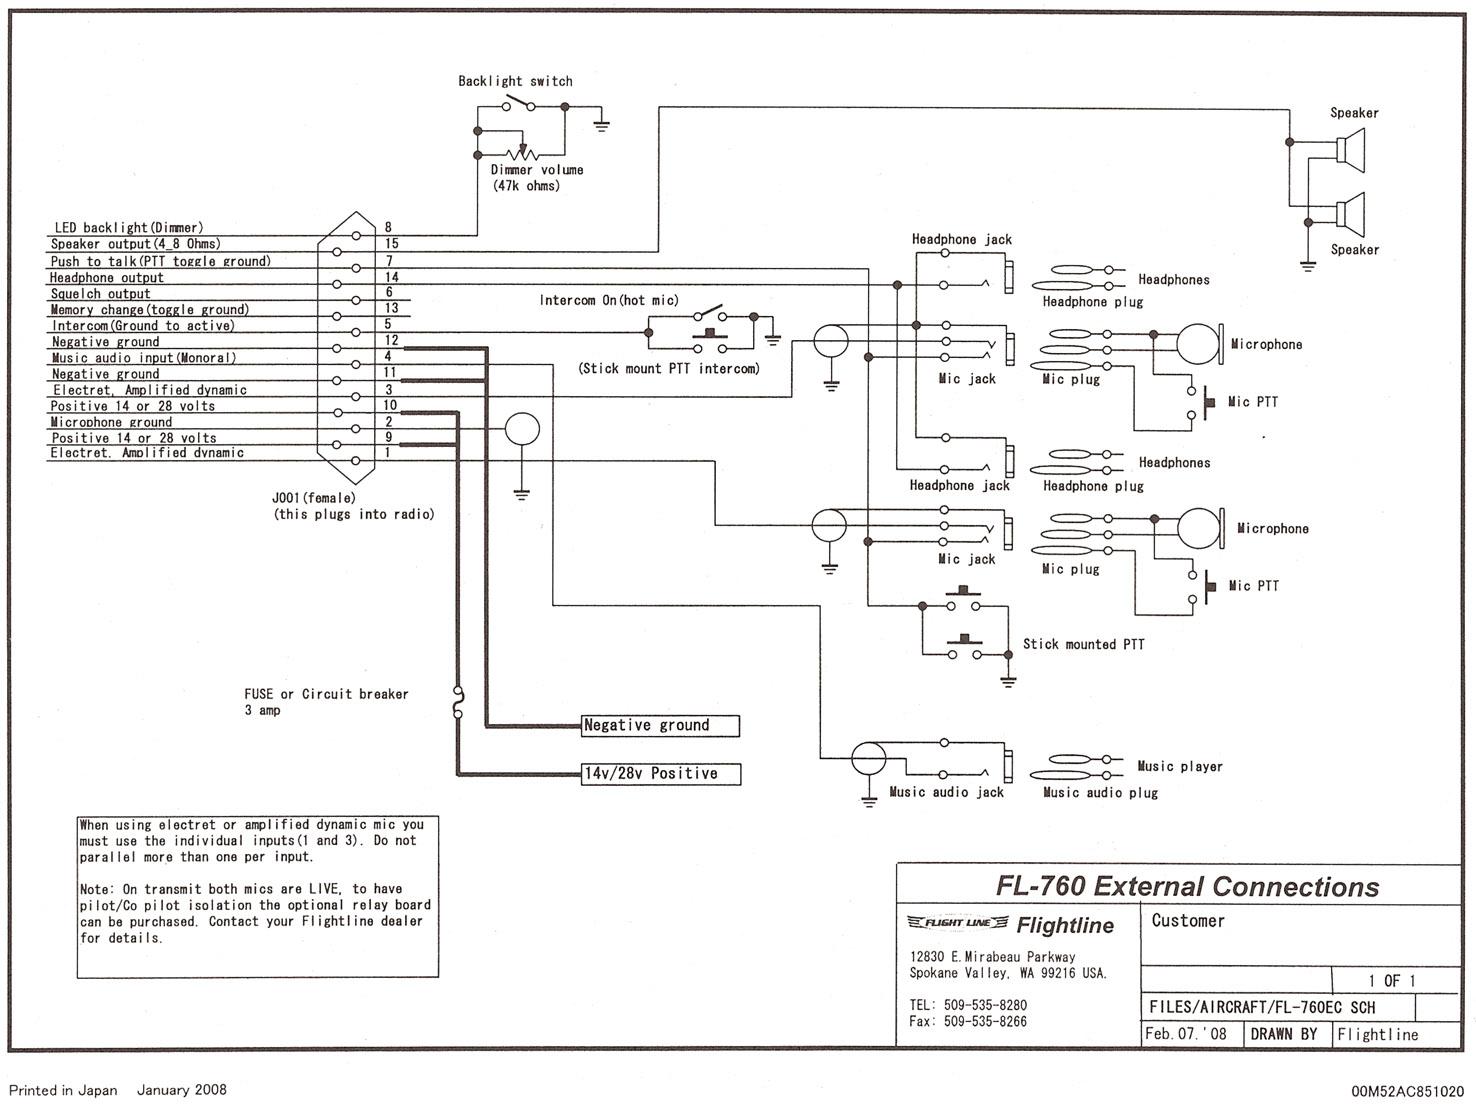 FL 760 Wiring Diagram?resize=665%2C499&ssl=1 push to talk switch wiring diagram wiring diagram flightline fl-760 wiring harness at fashall.co